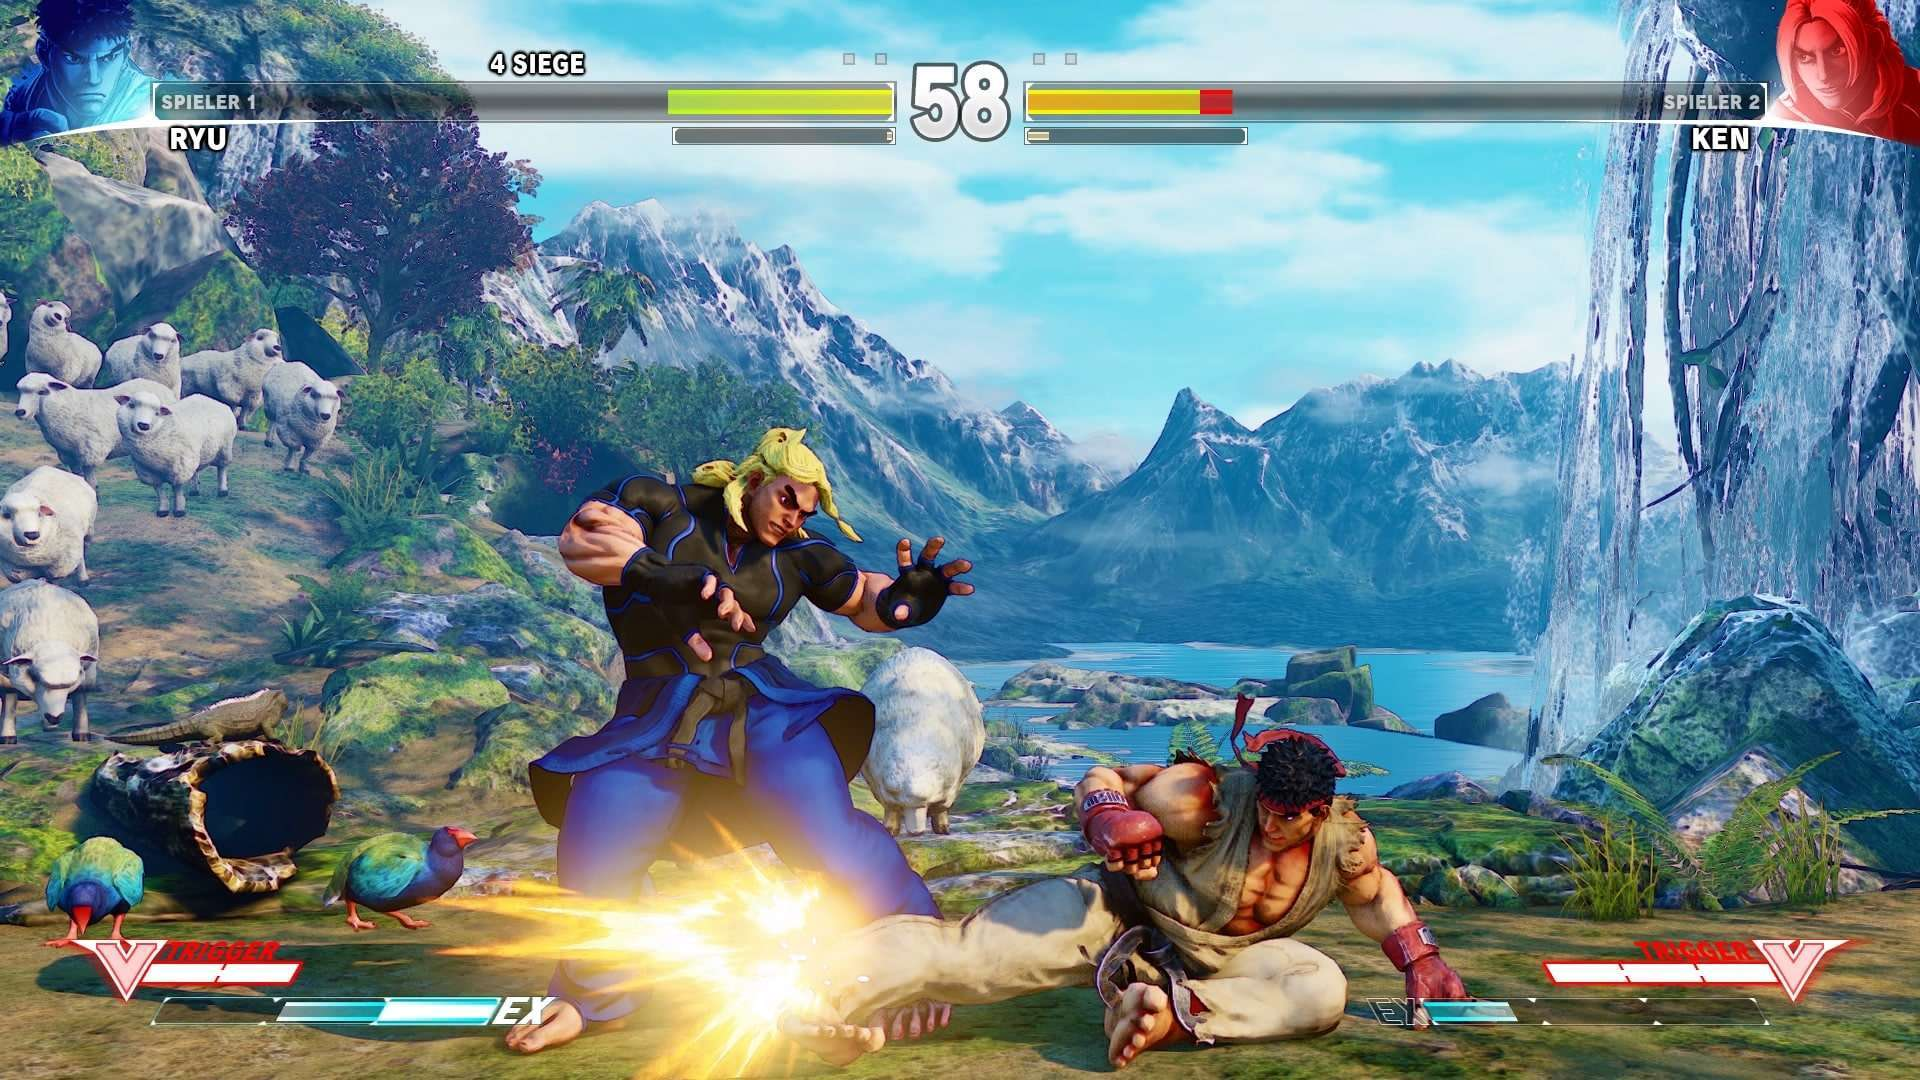 Hadoken strikes again – Street Fighter V (PS4) kurz angespielt 10 techboys.de • smarte News, auf den Punkt! Hadoken strikes again – Street Fighter V (PS4) kurz angespielt